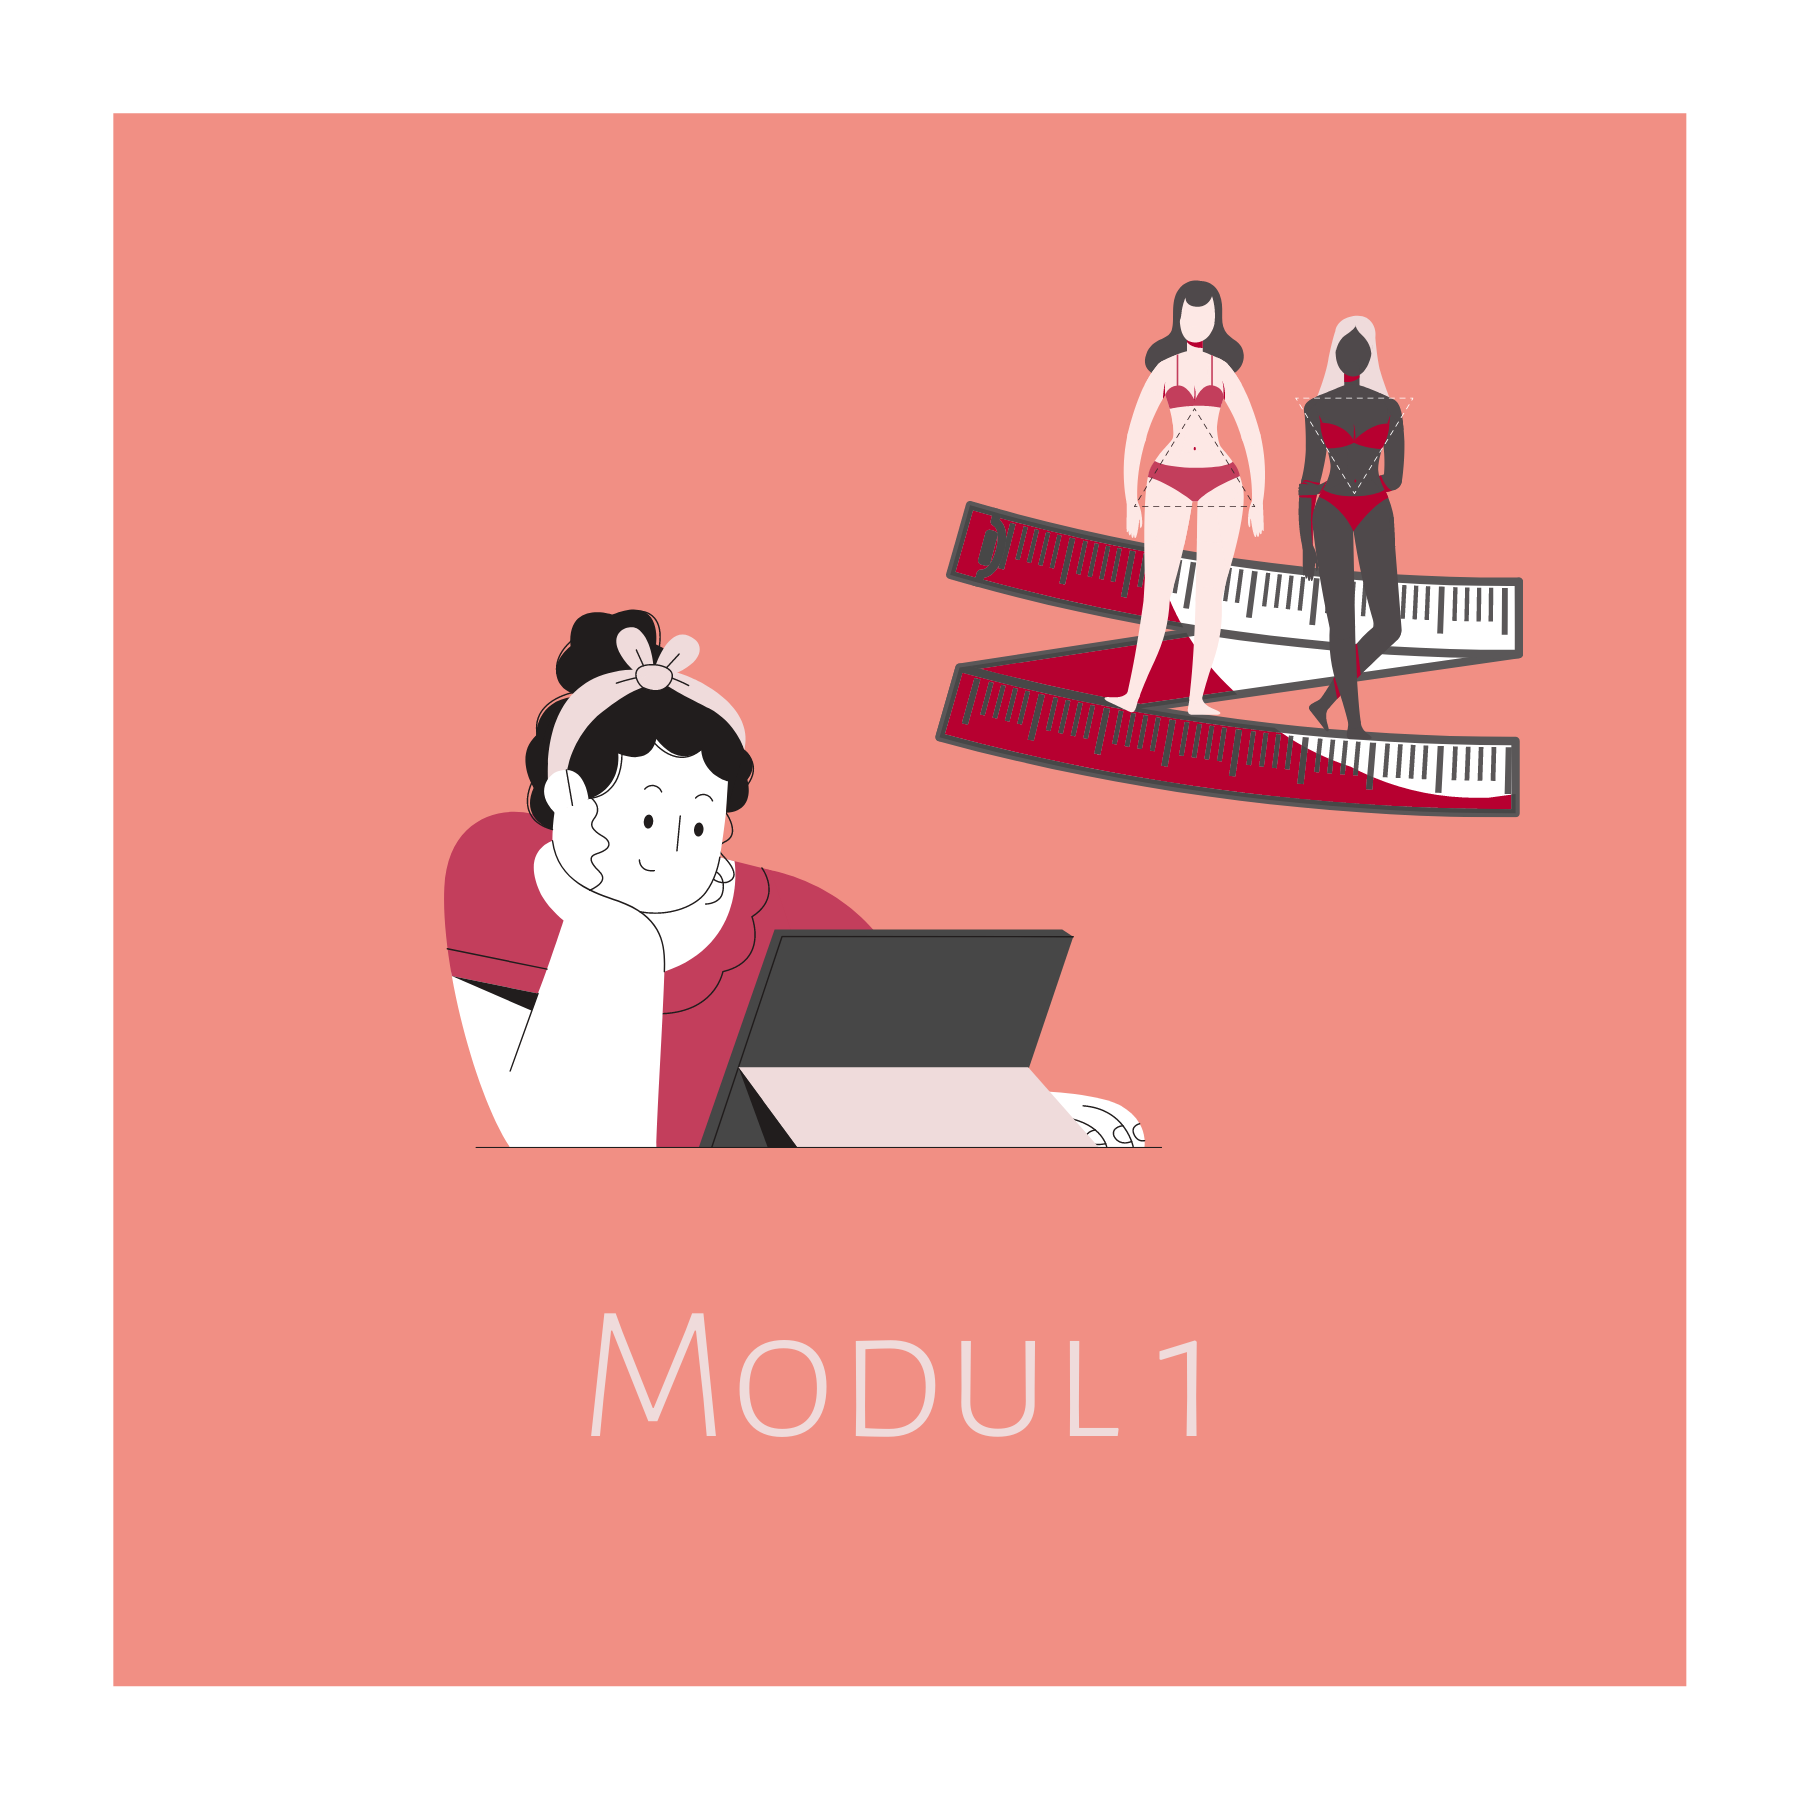 dessous_design_online_ktriny_modul1